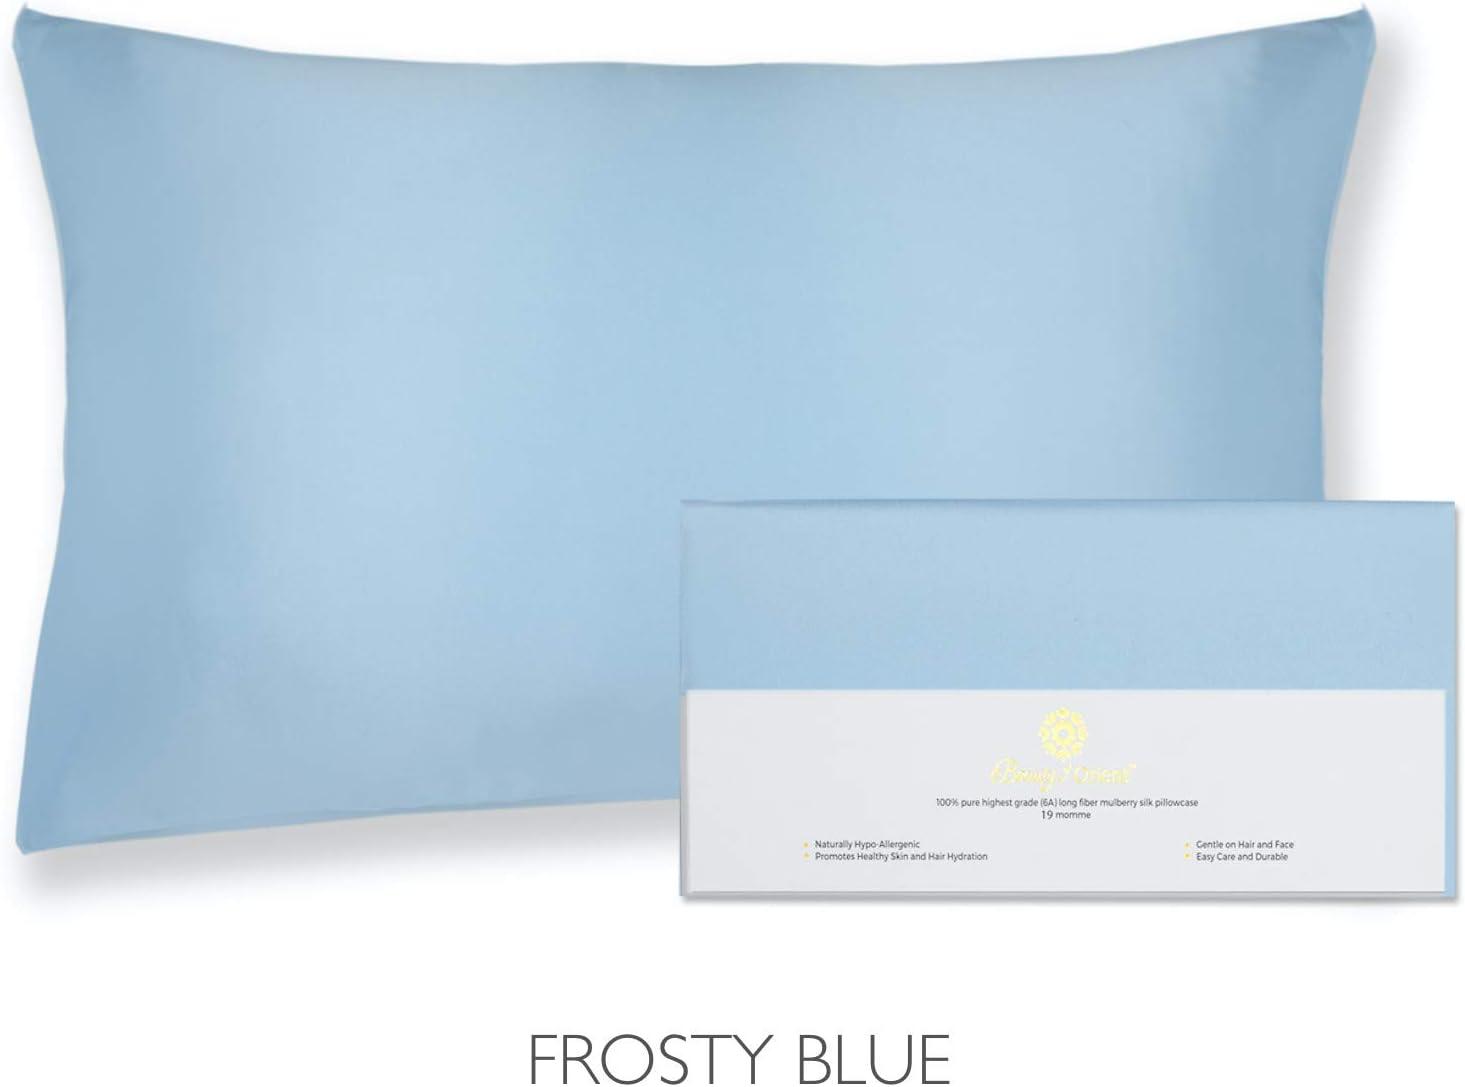 "BEAUTY OF ORIENT - 100% Pure Mulberry Silk Pillowcase for Hair and Skin, 19 Momme Both Sides, Hidden Zipper, Natural Hypoallergenic Silk Pillow Case, Best Sleep (1pc Standard - 20"" x 26"", Frosty Blue)"